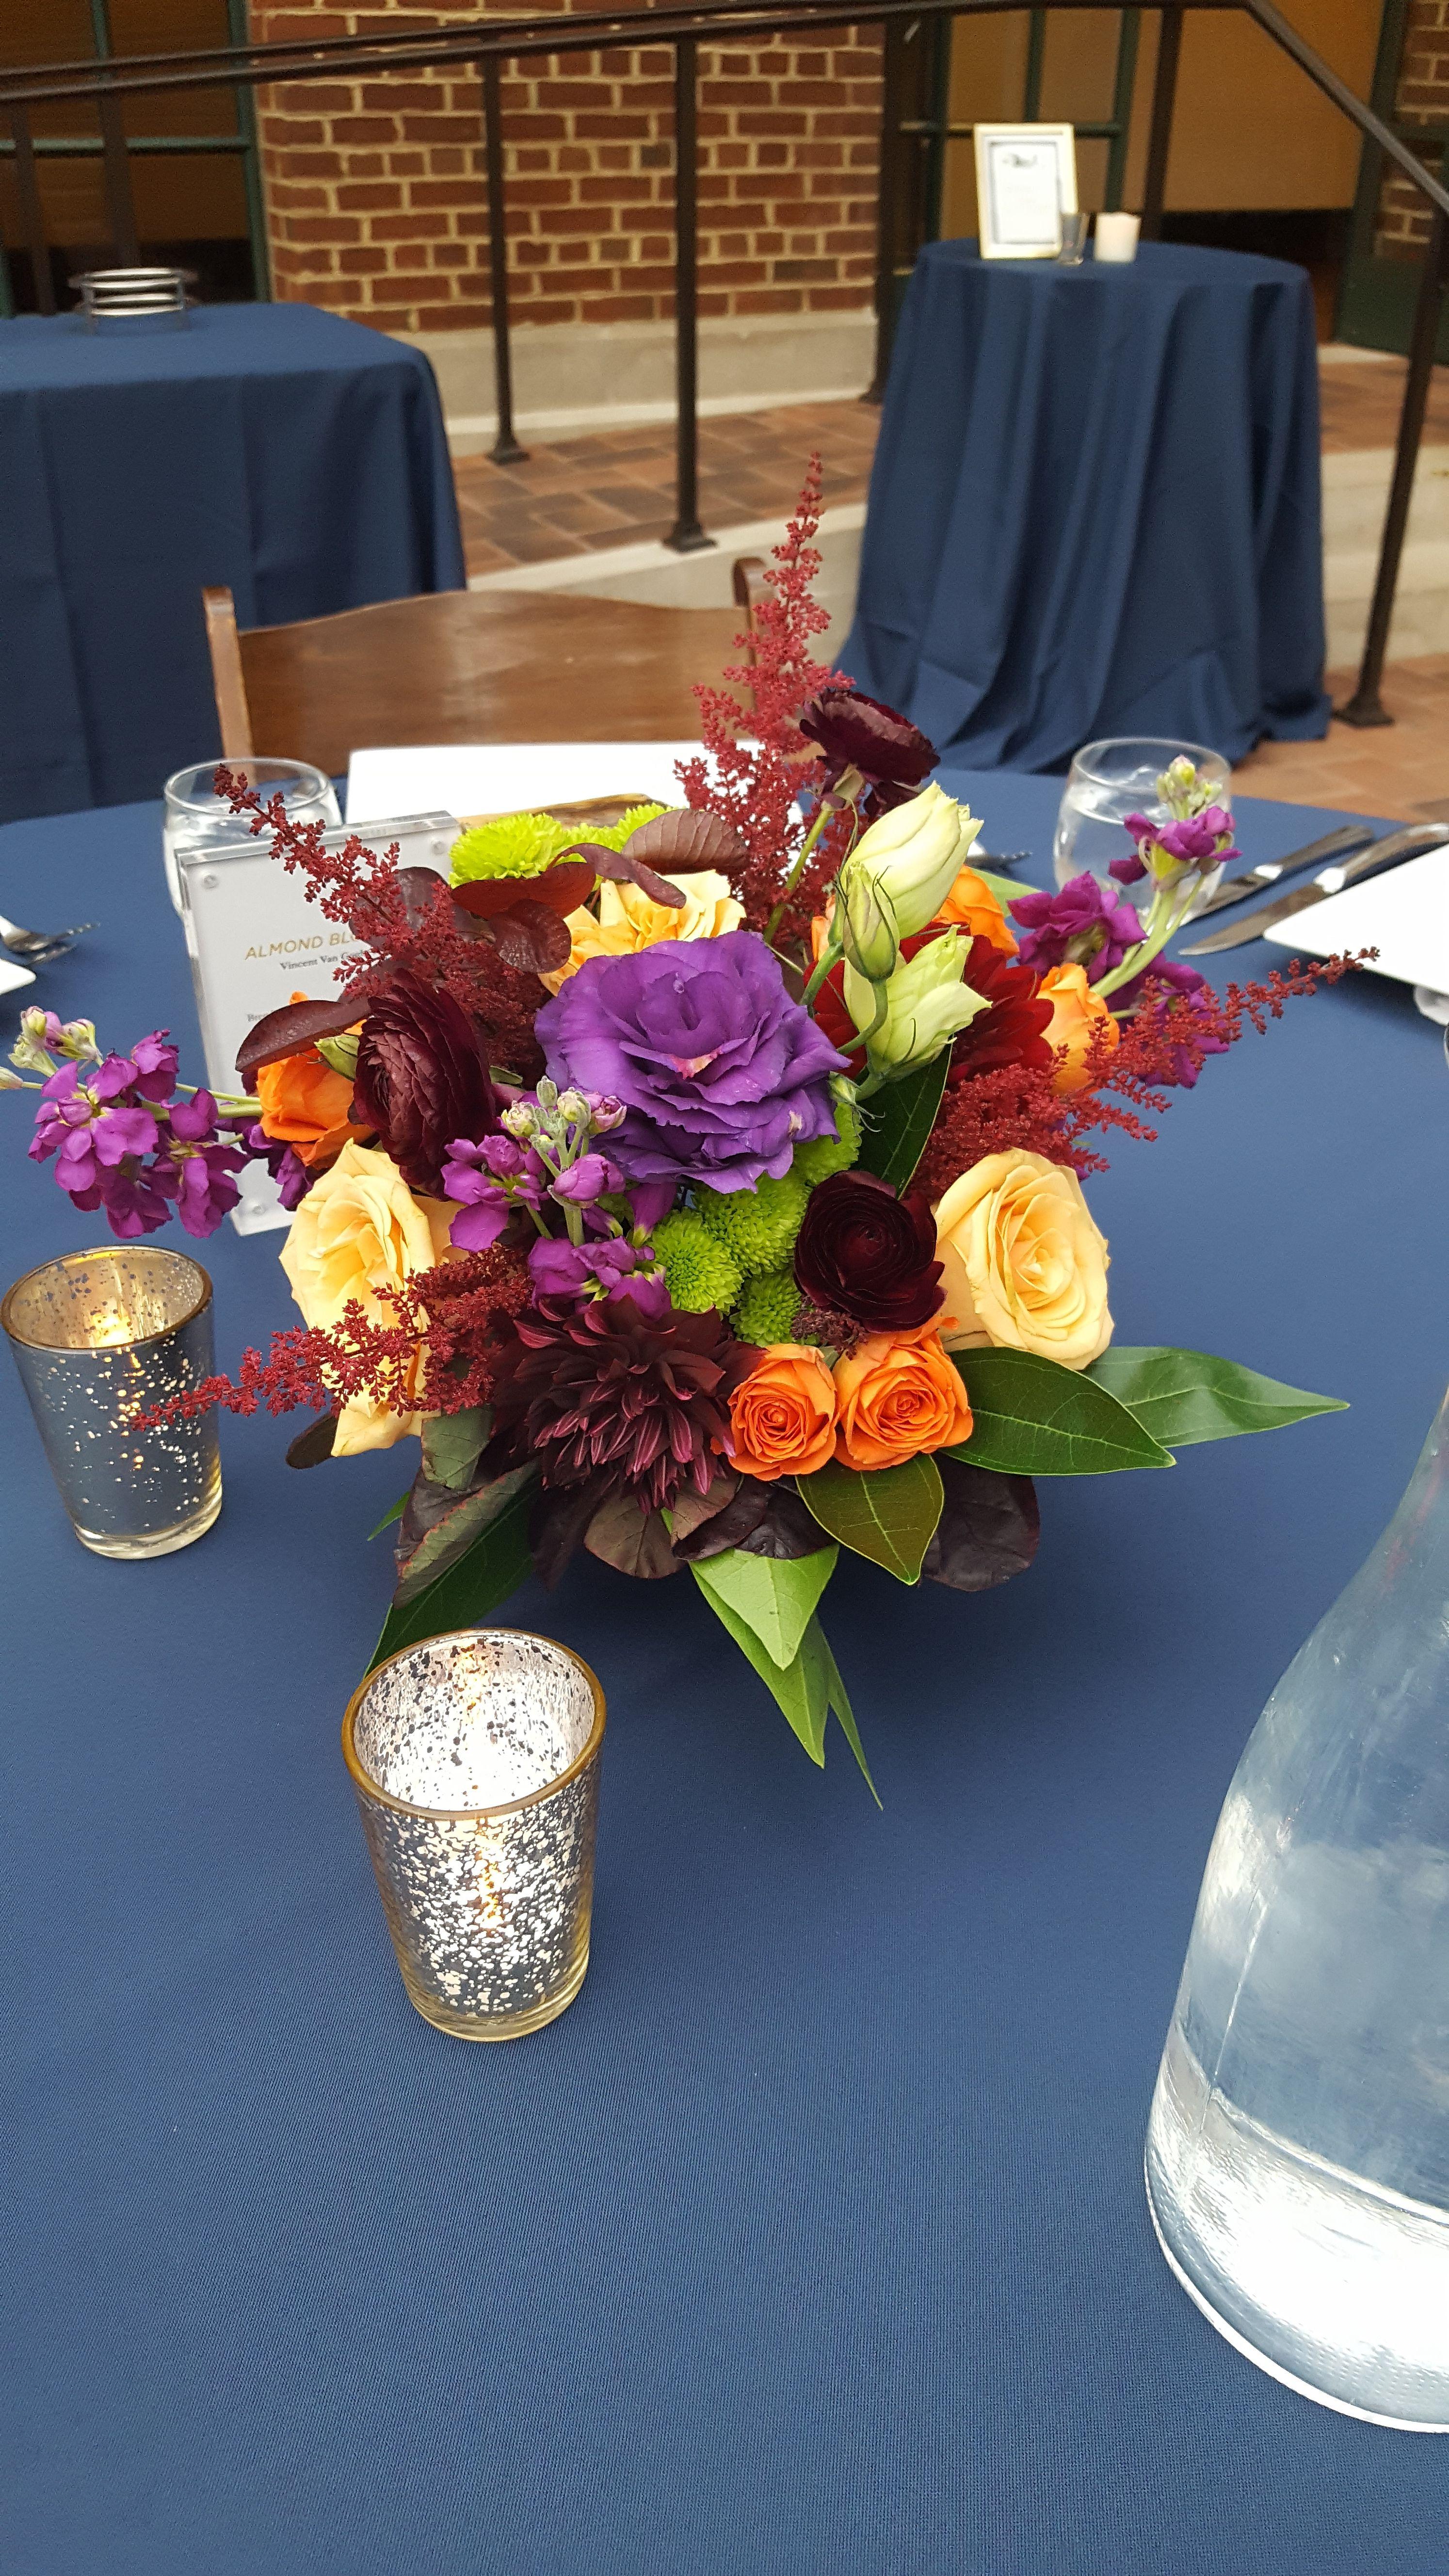 Burgundy, plum, burnt orange and yellow wedding